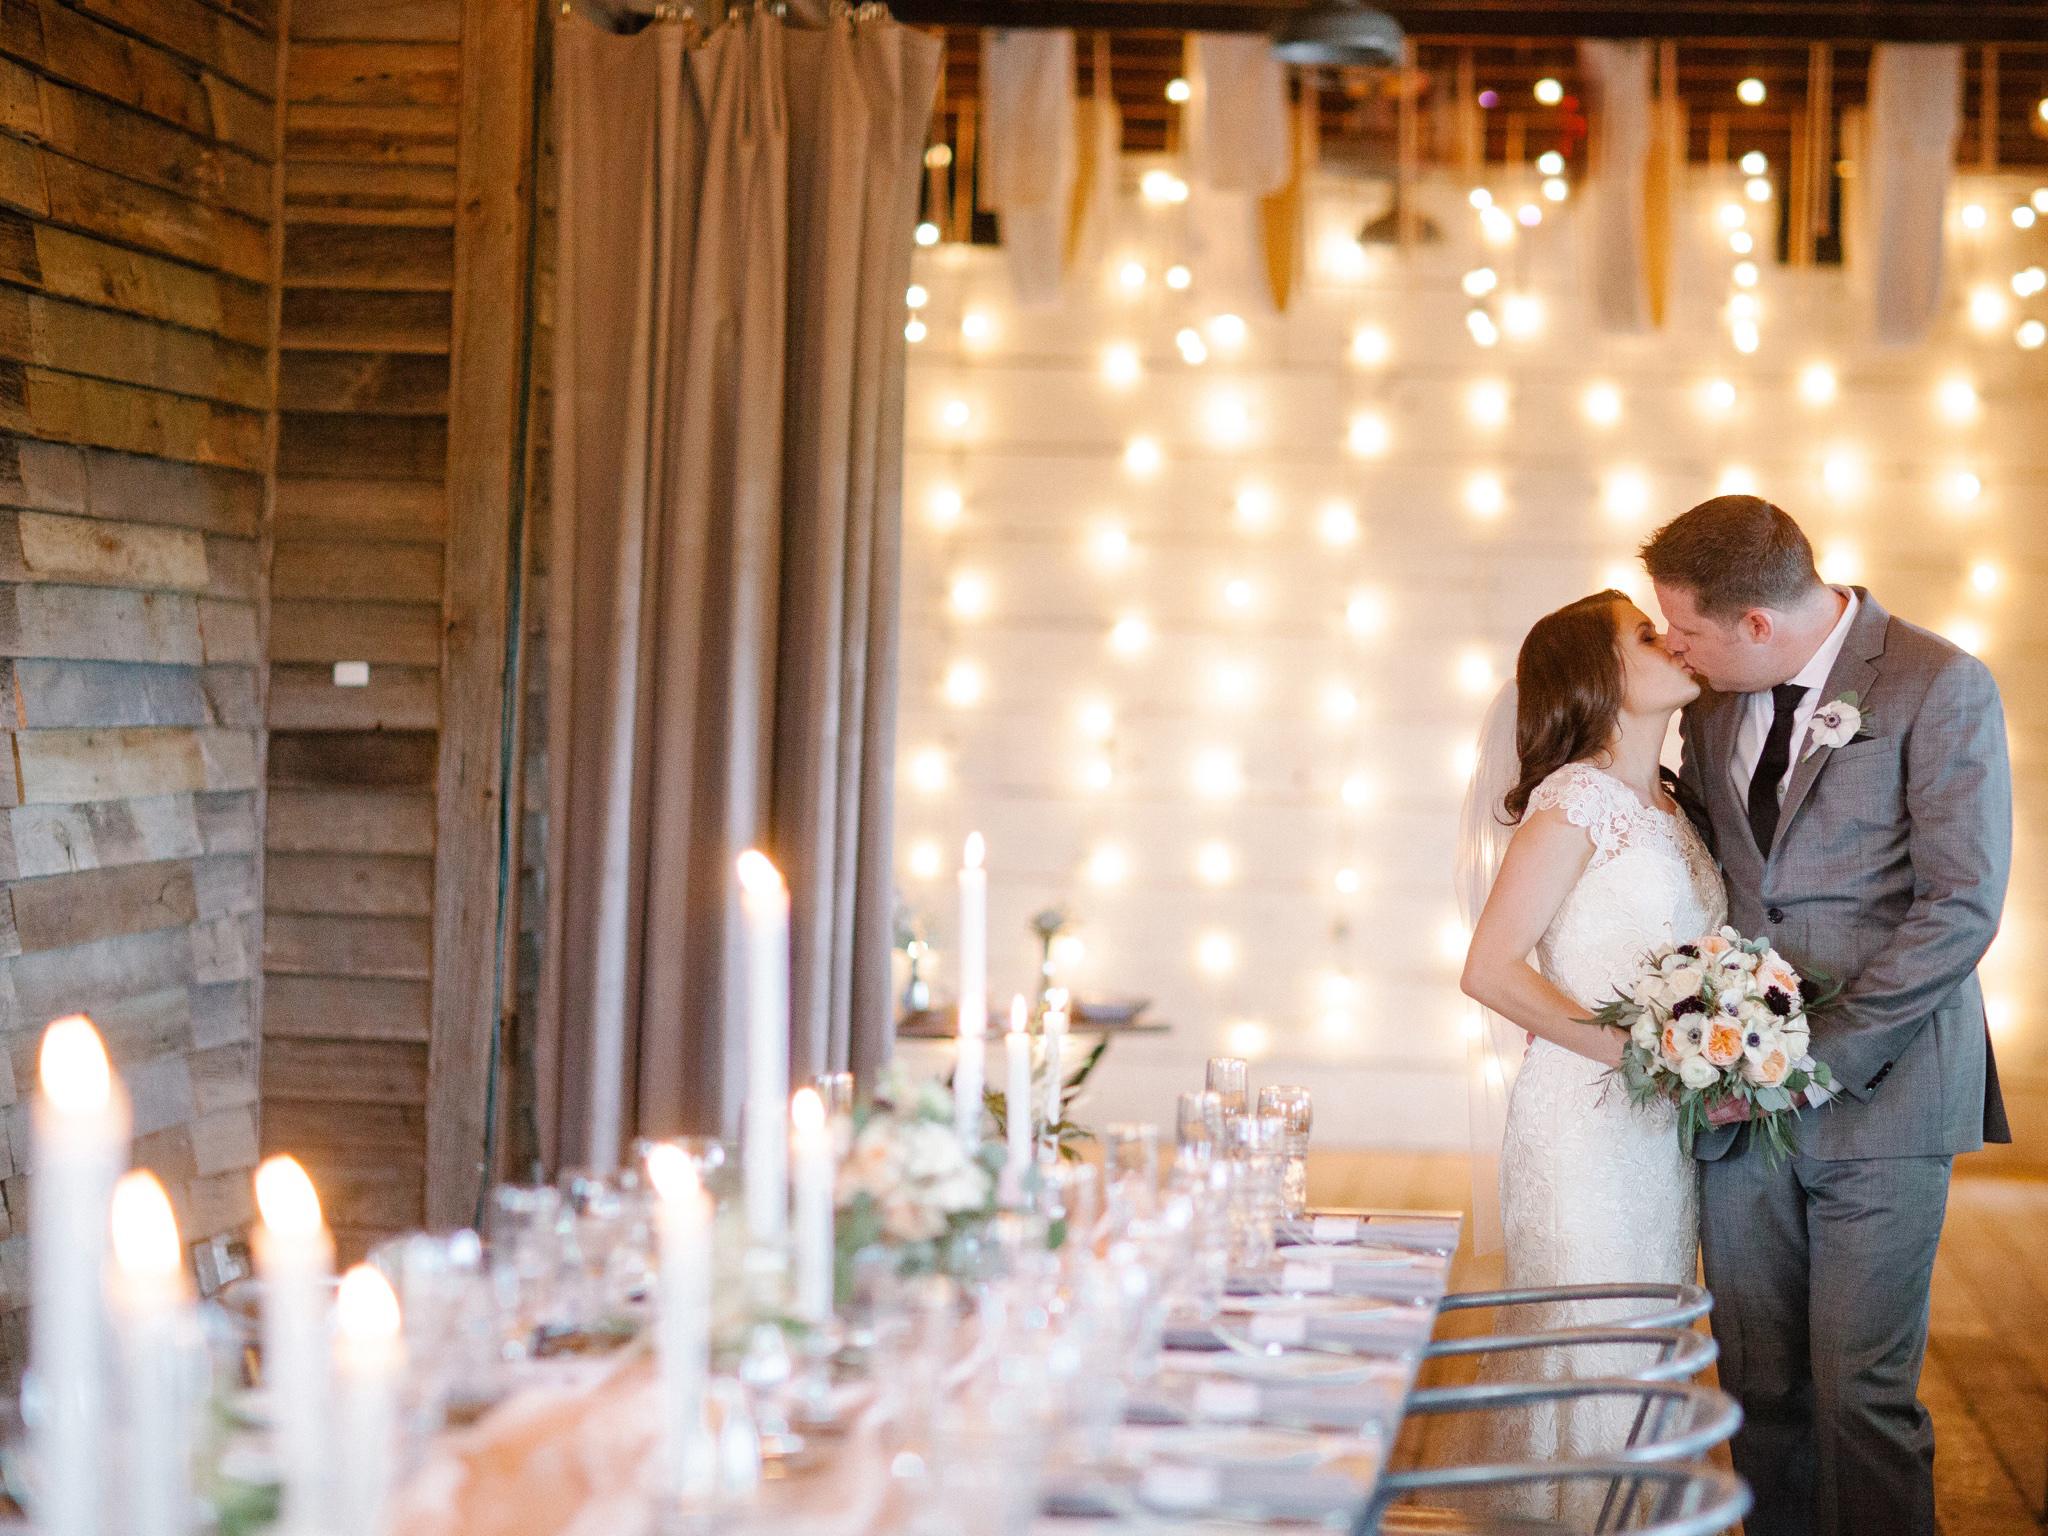 Heart-And-Dash-Terrain-at-Styers-Wedding-Planner-Stylist.jpg